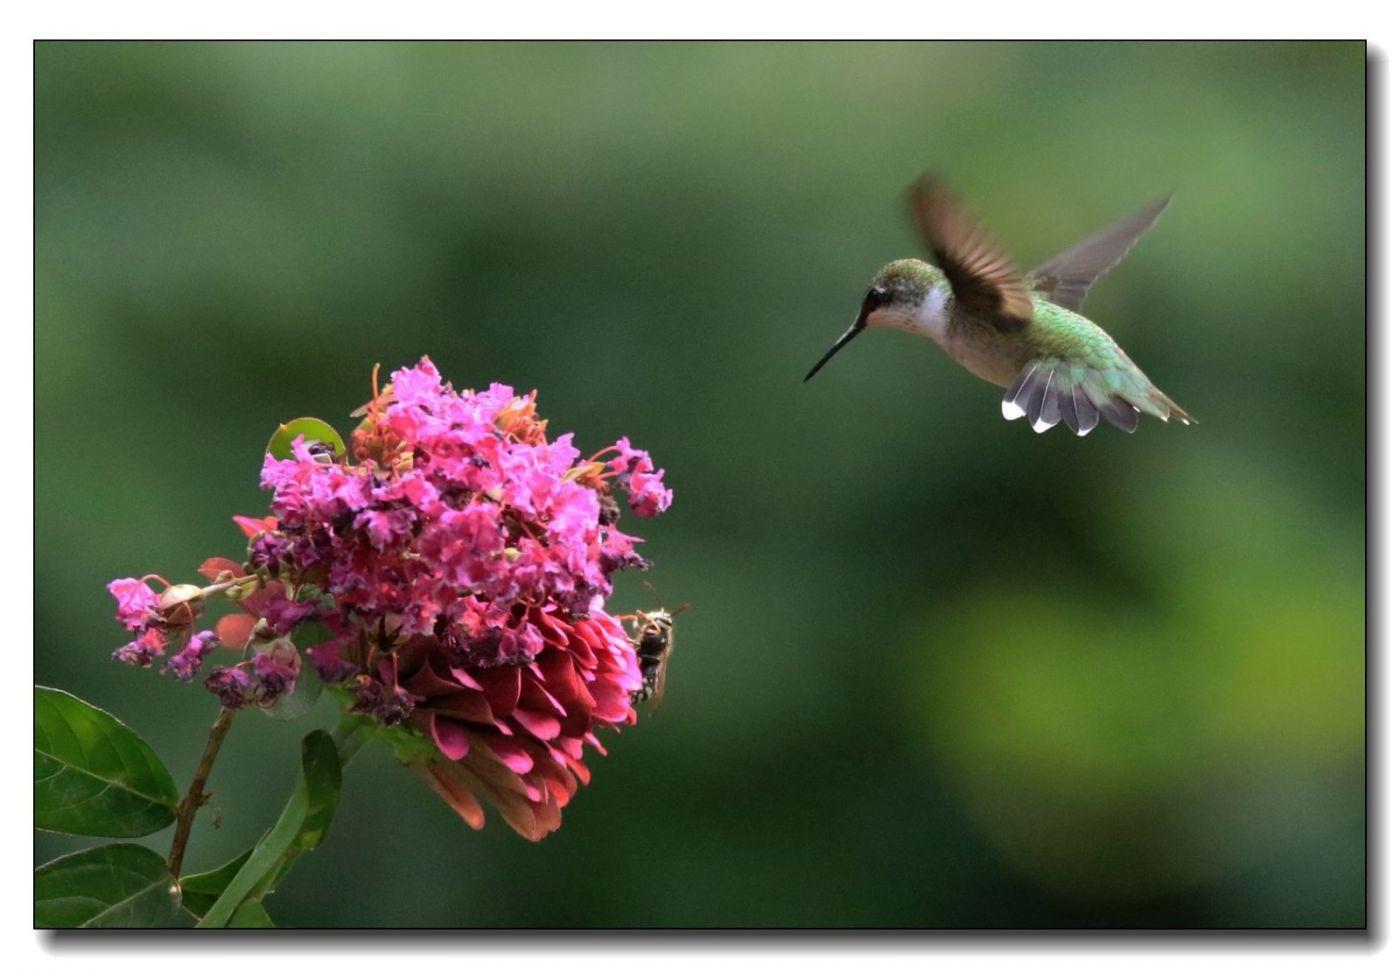 蜂鸟组图(一)_图1-12